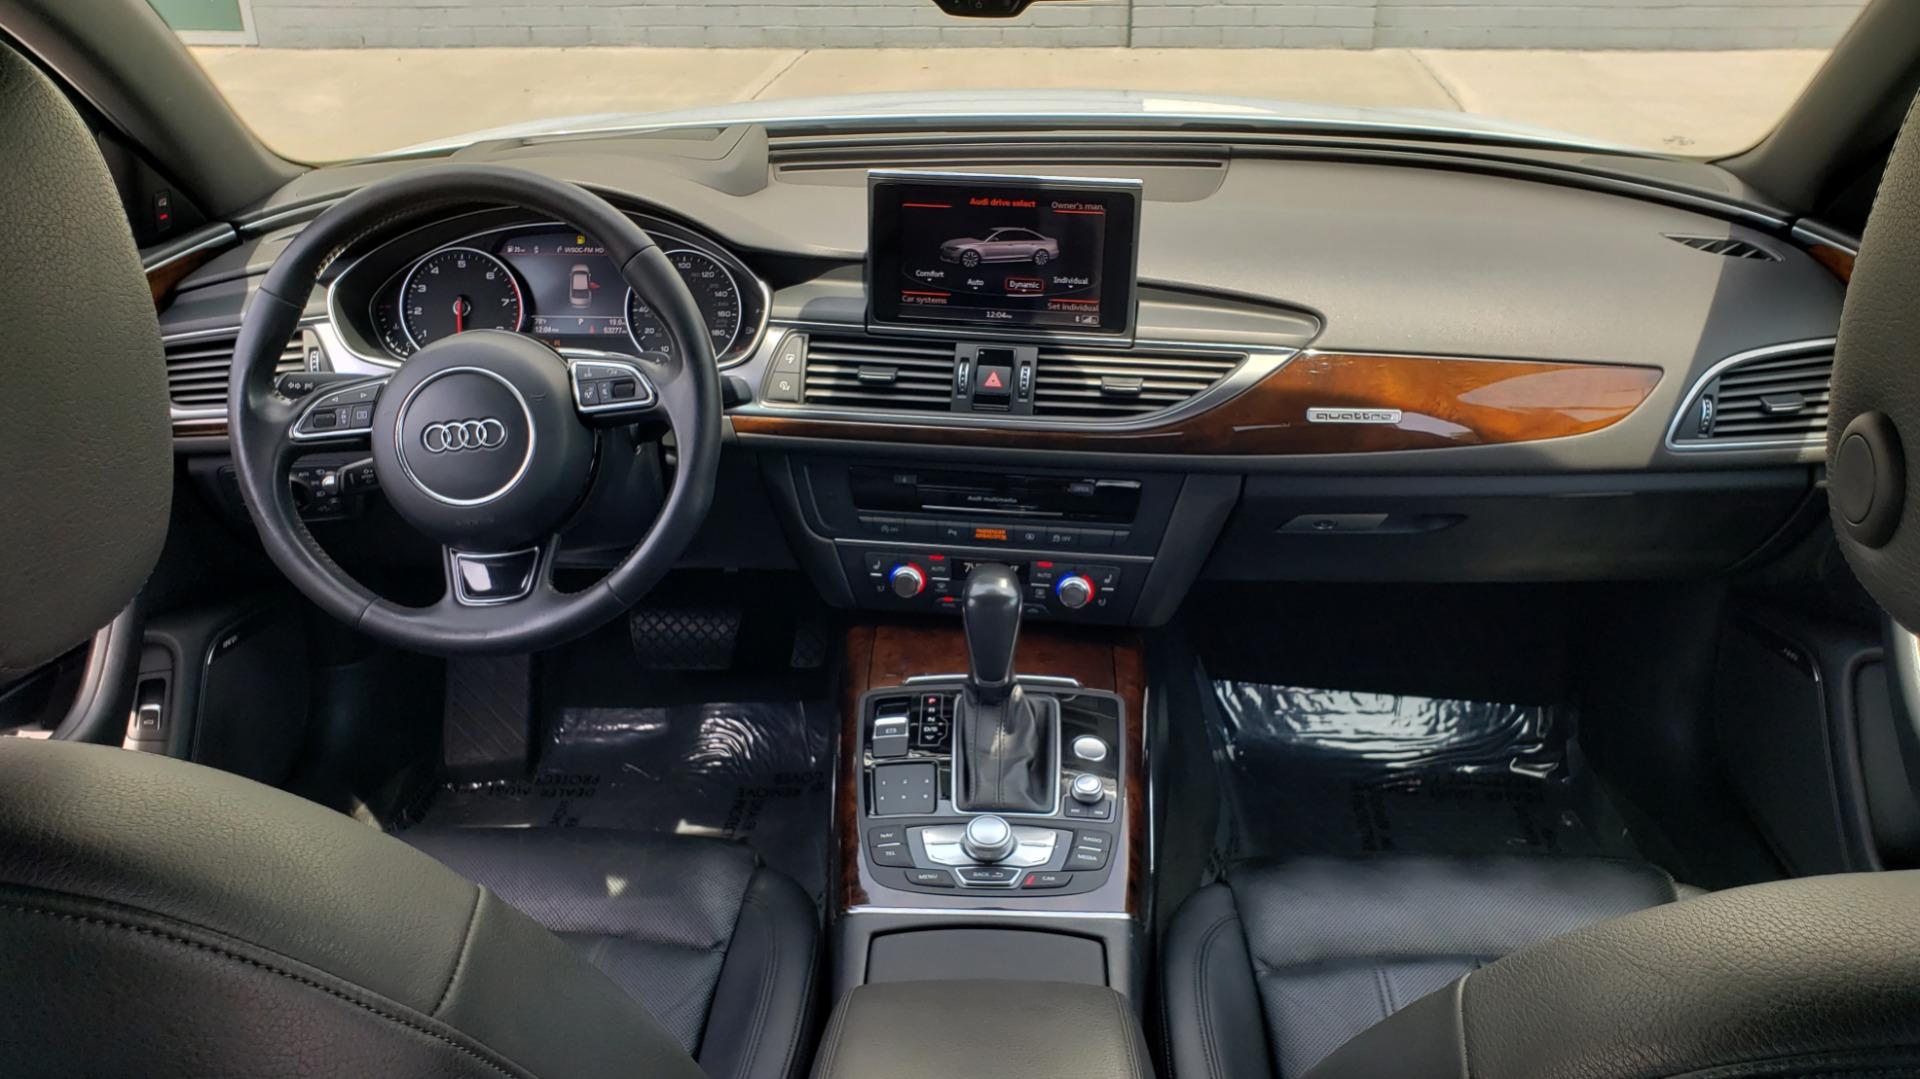 Used 2017 Audi A6 PRESTIGE SEDAN 3.0T / NAV / SUNROOF / BLACK OPTIC / CLD WTHR / REARVIEW for sale $30,797 at Formula Imports in Charlotte NC 28227 80